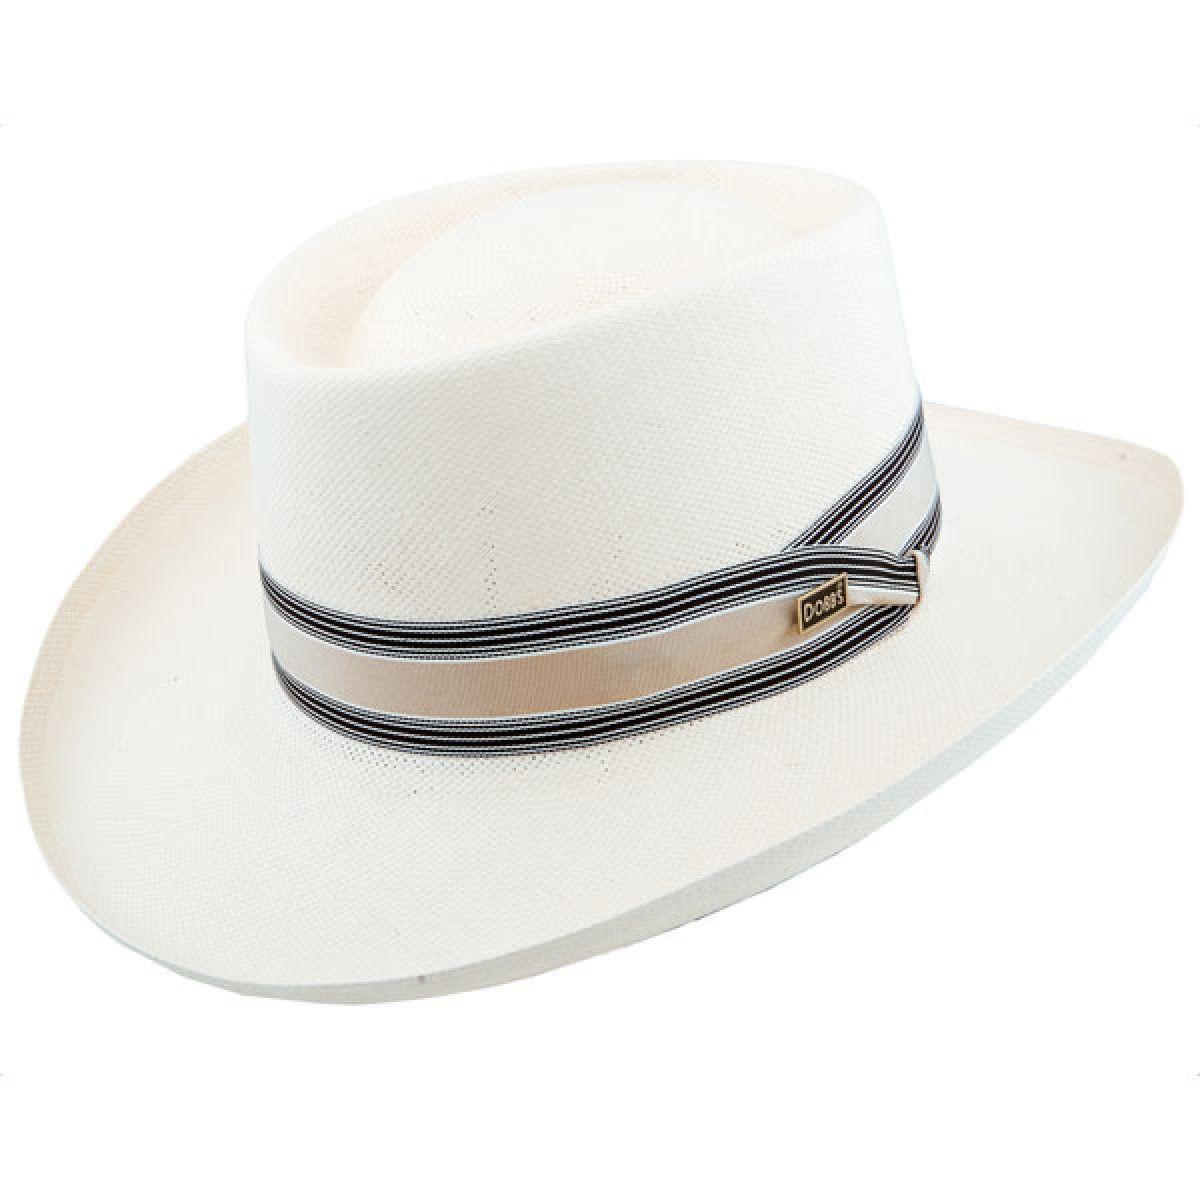 63bfda8dcff Dobbs Kingston - Panama Straw Gambler Hat  ThingstoWear